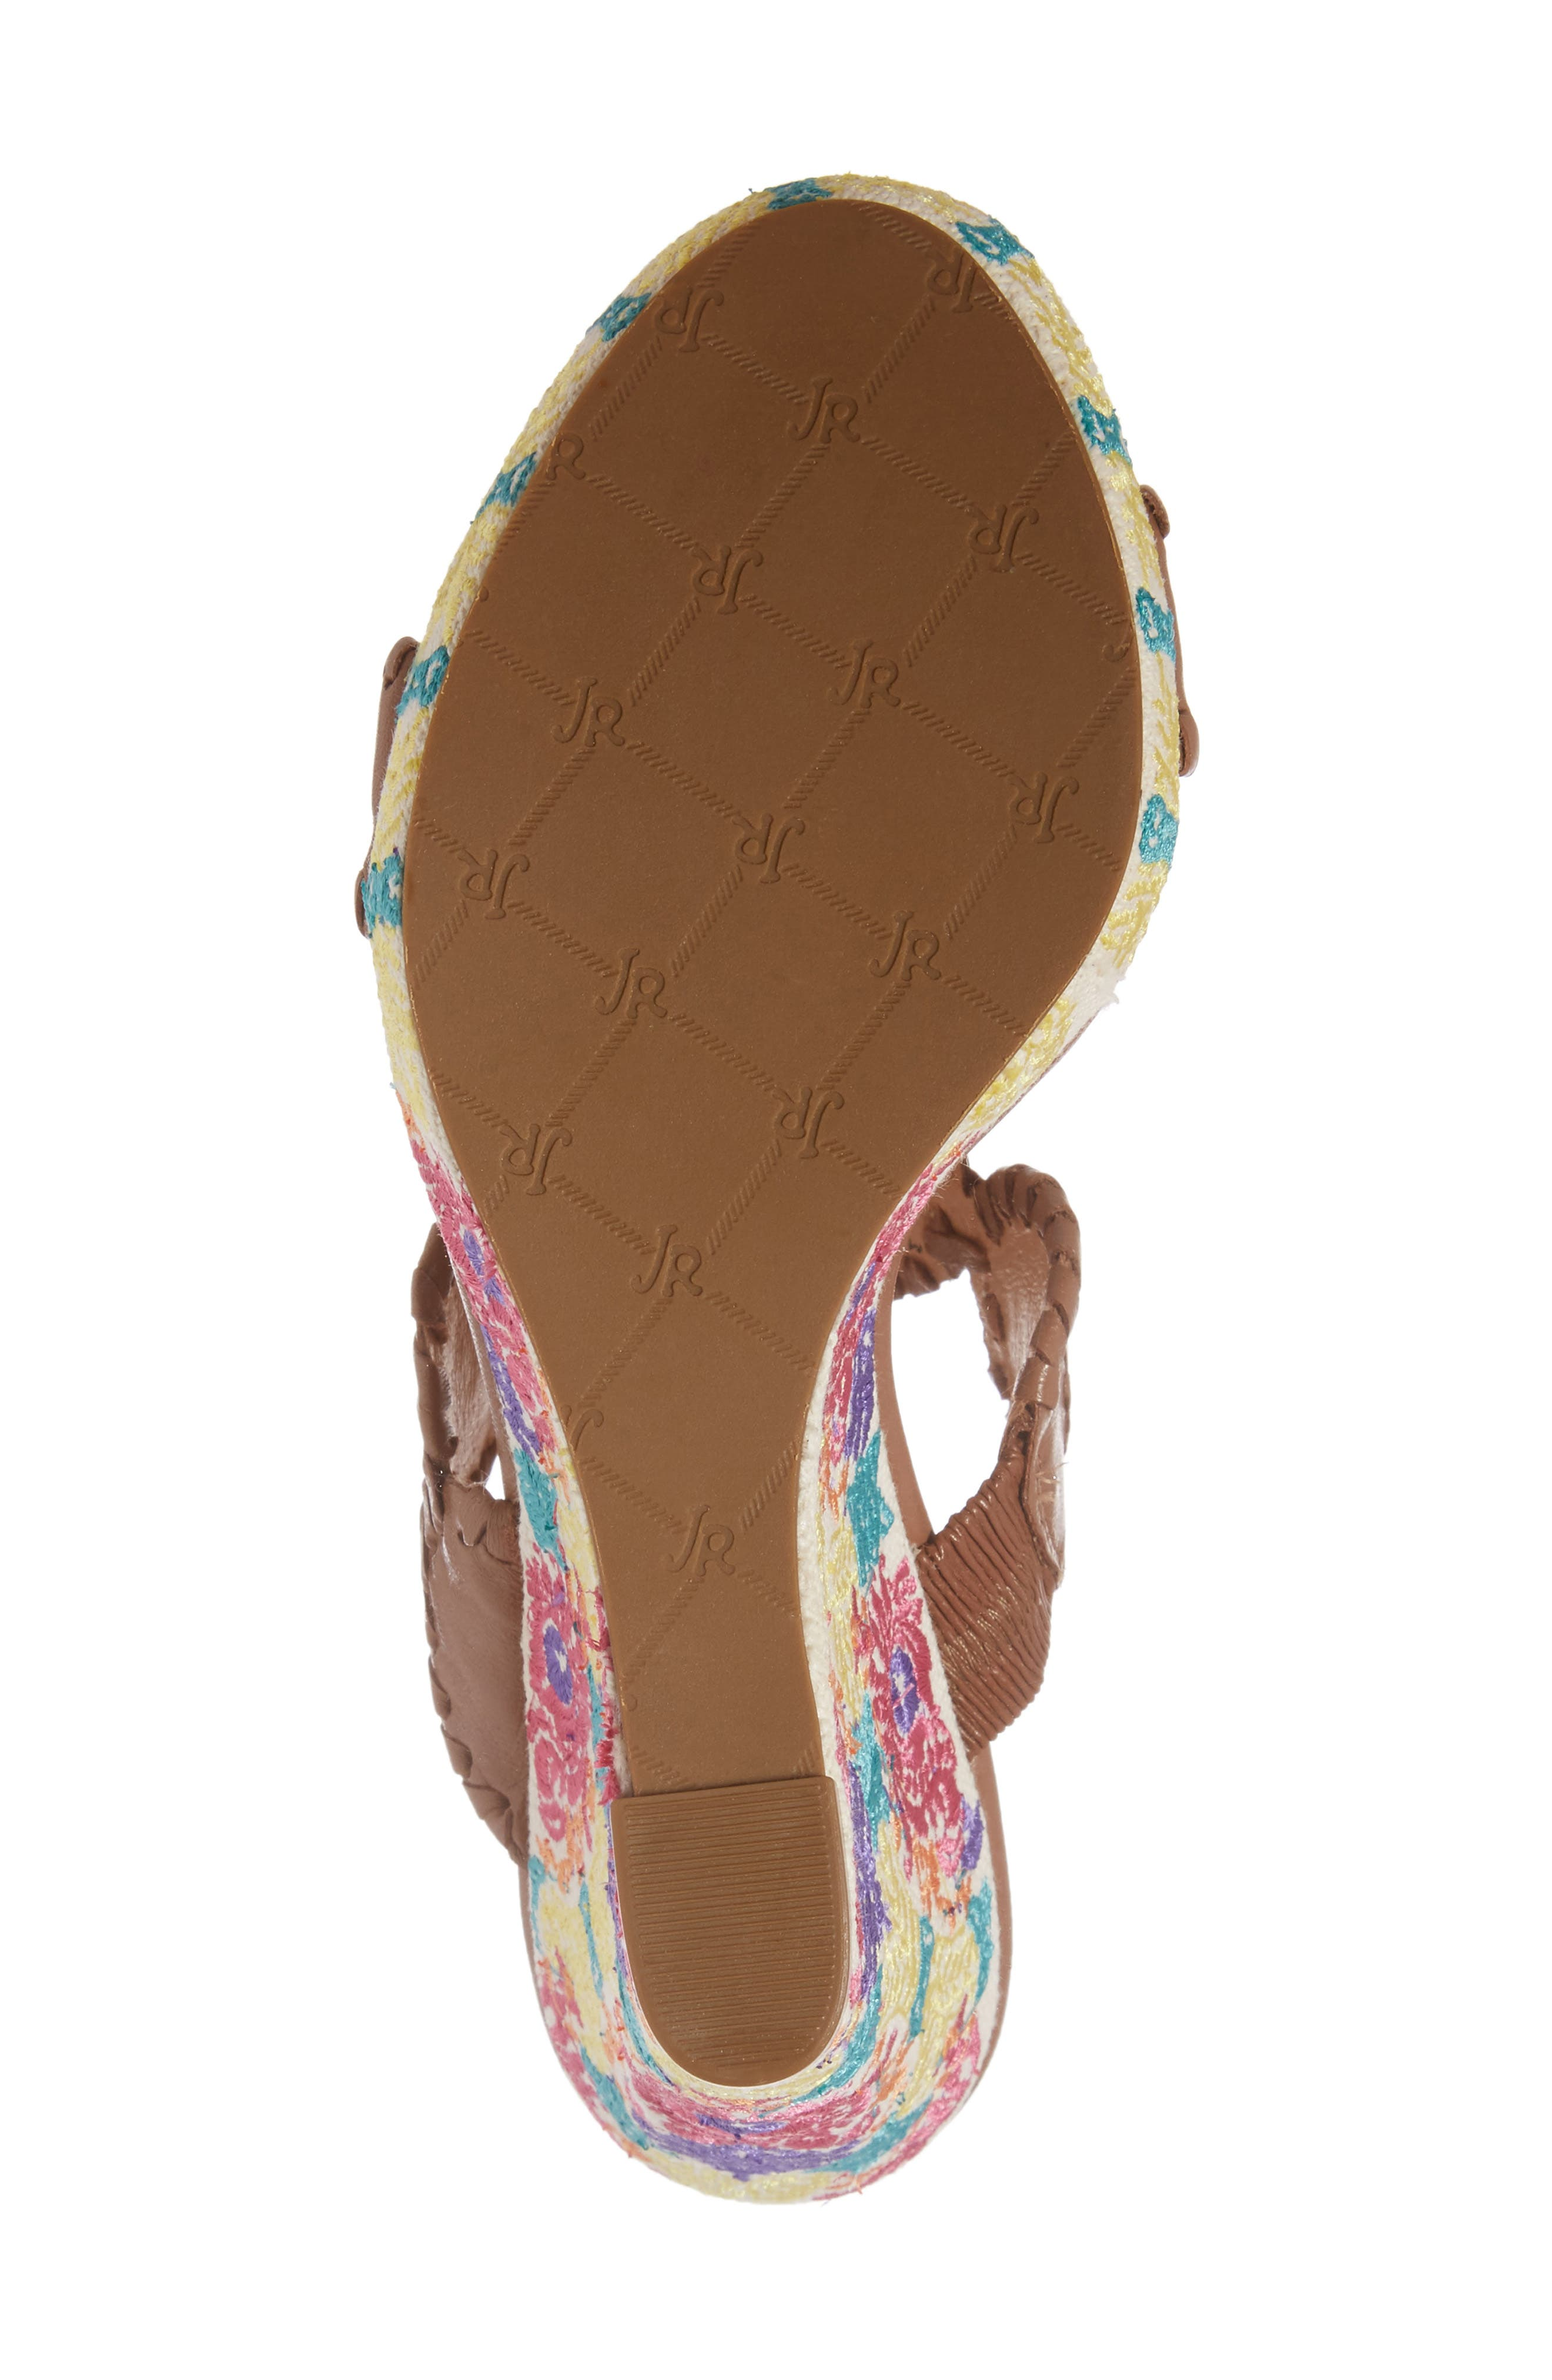 Livvy Wedge Slide Sandal,                             Alternate thumbnail 6, color,                             Cognac Leather